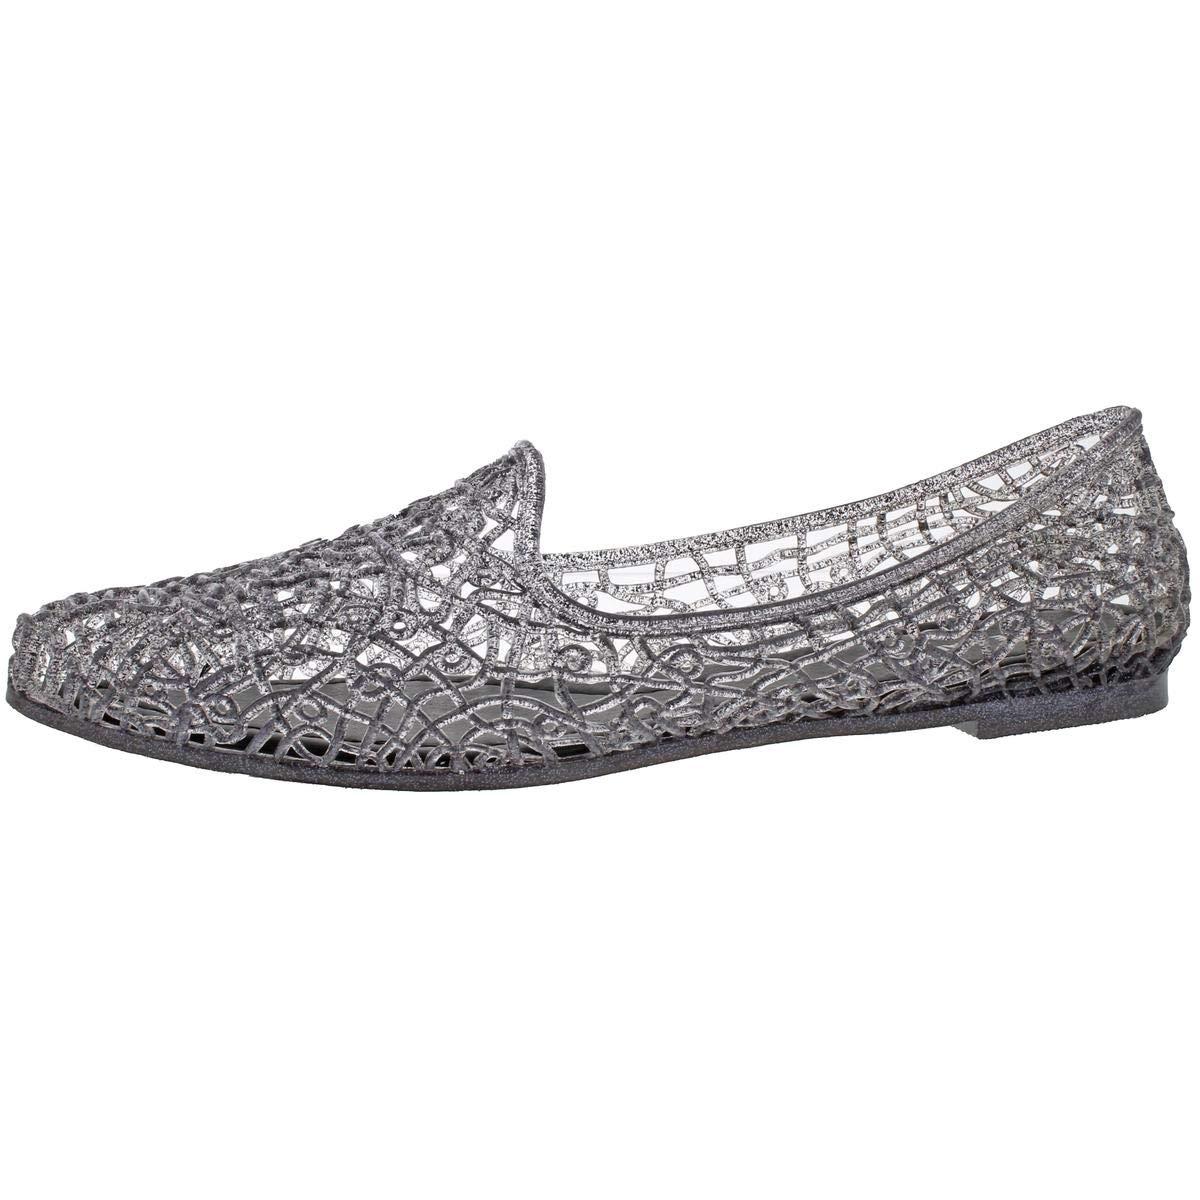 d41b8820fc9 Amazon.com | Steve Madden Womens Carline Laser Cut Pointed Toe Flats ...